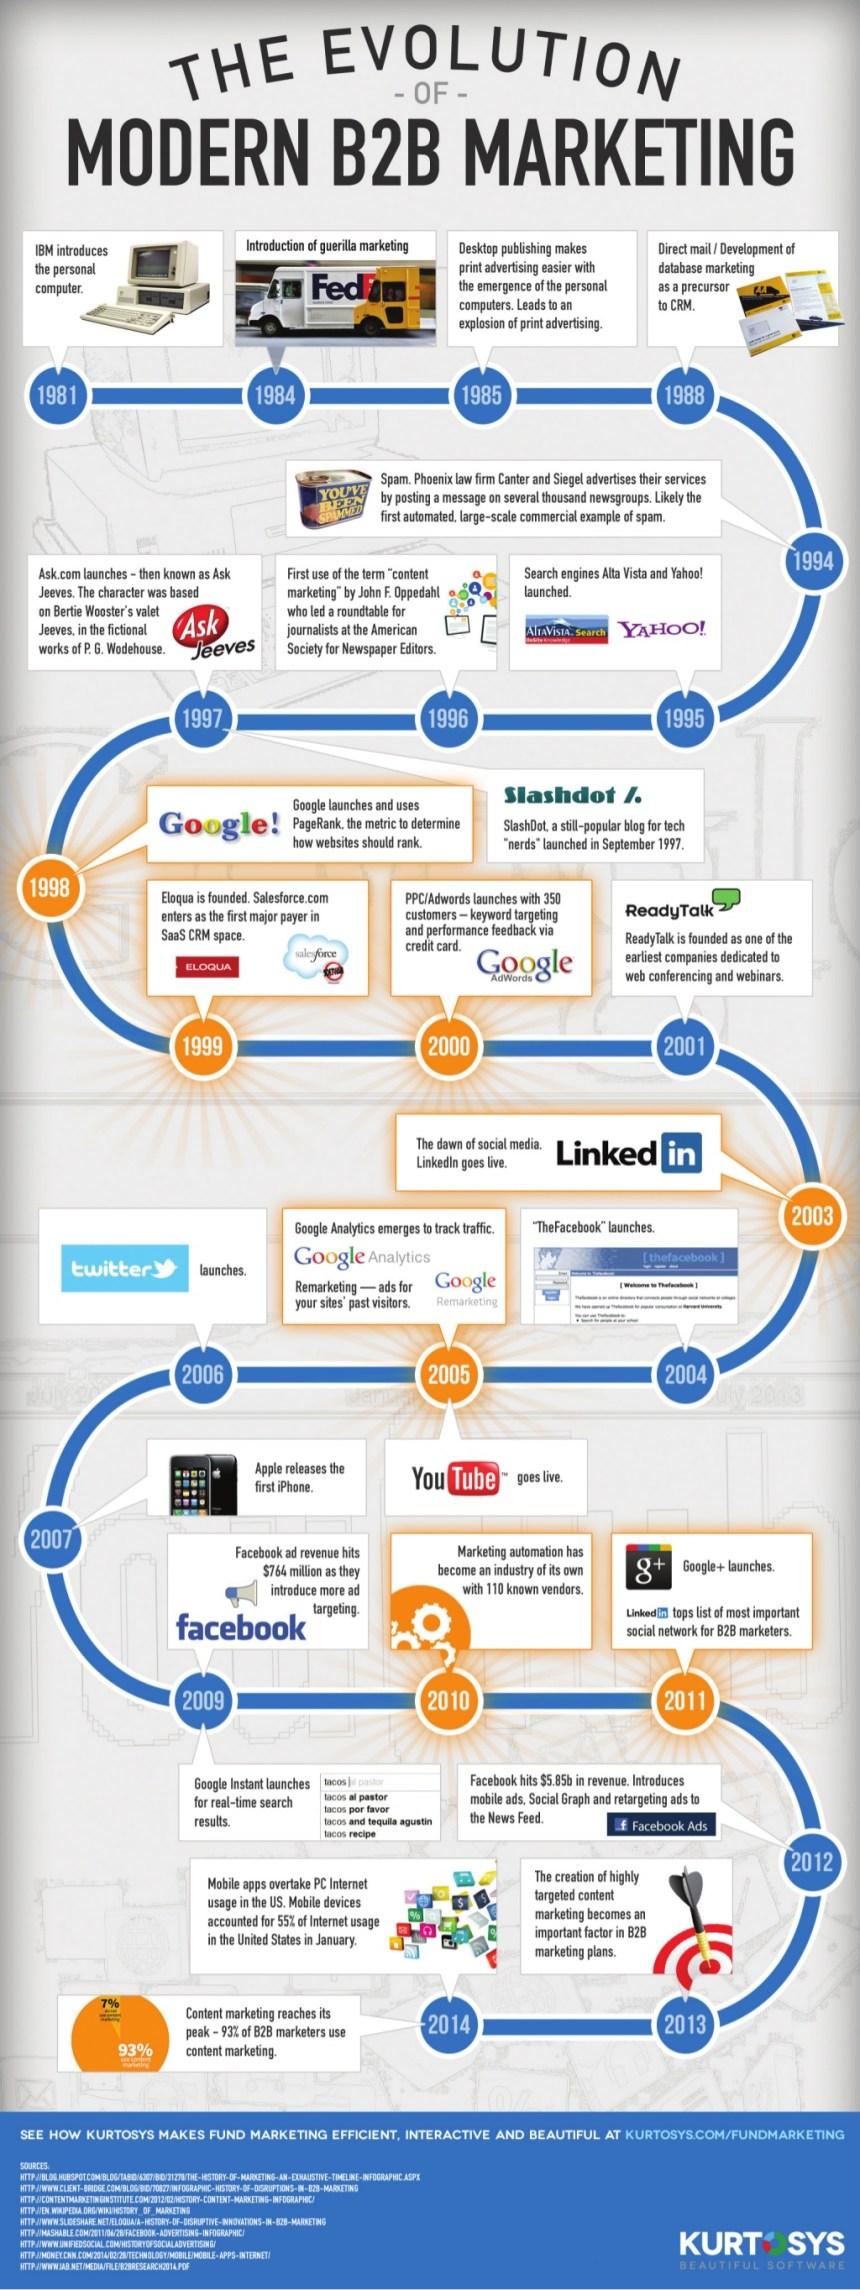 Marketing B2B moderno: la evolución